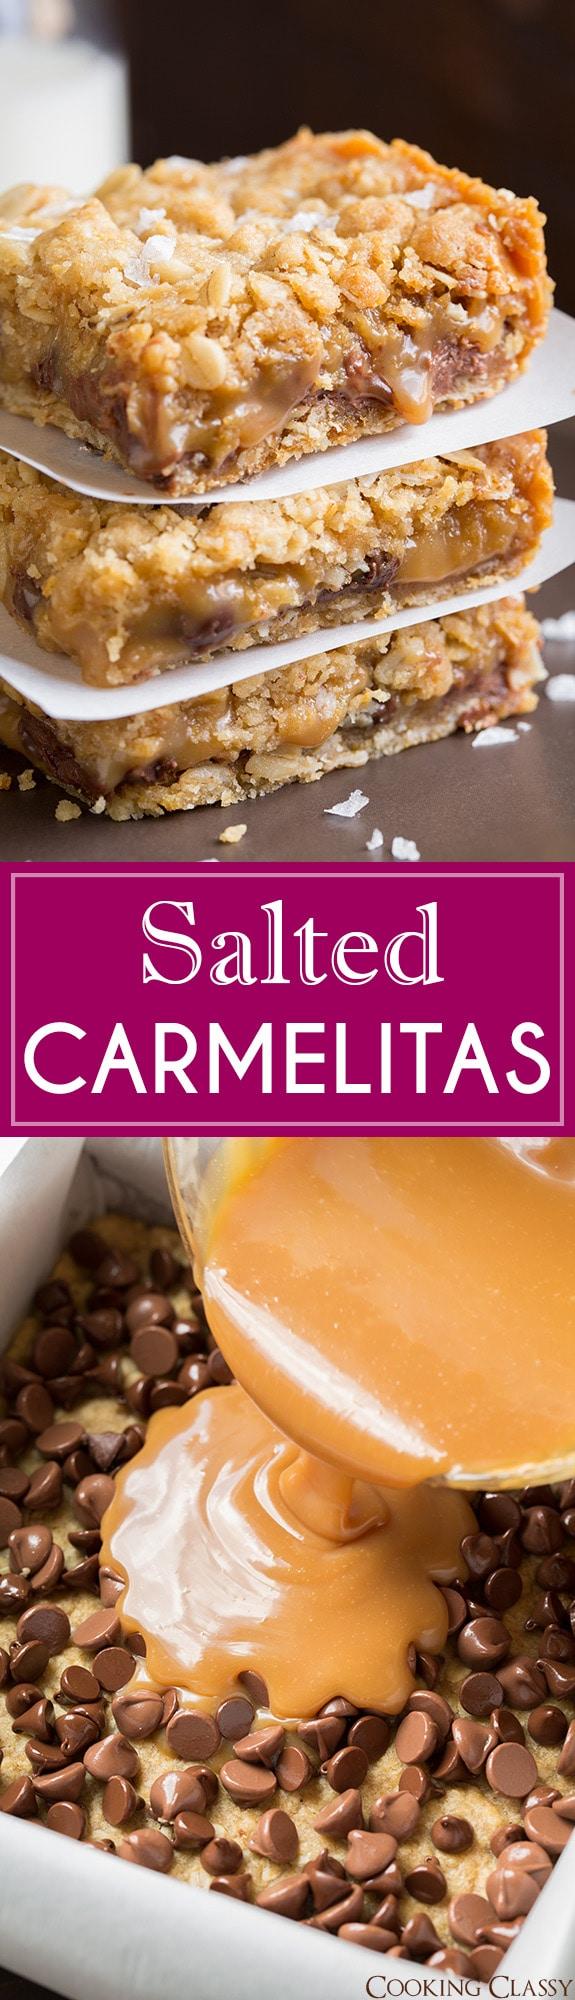 Salted Carmelitas | Cooking Classy